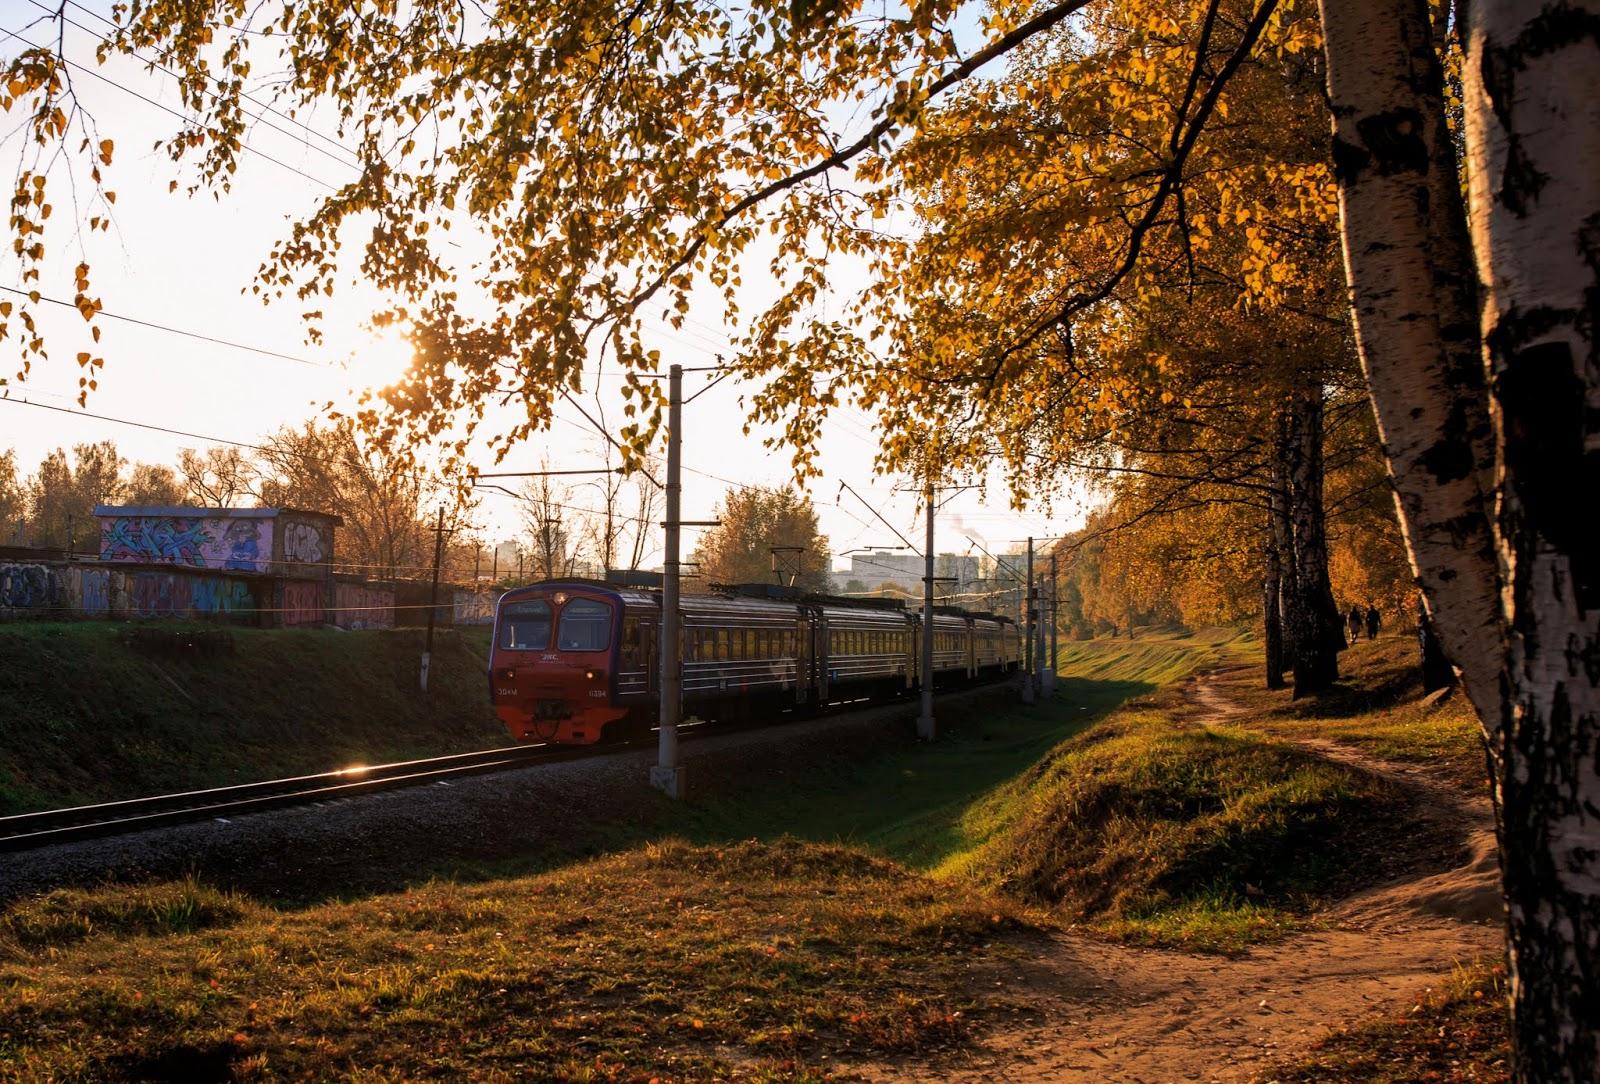 Картинки дорог с осенью